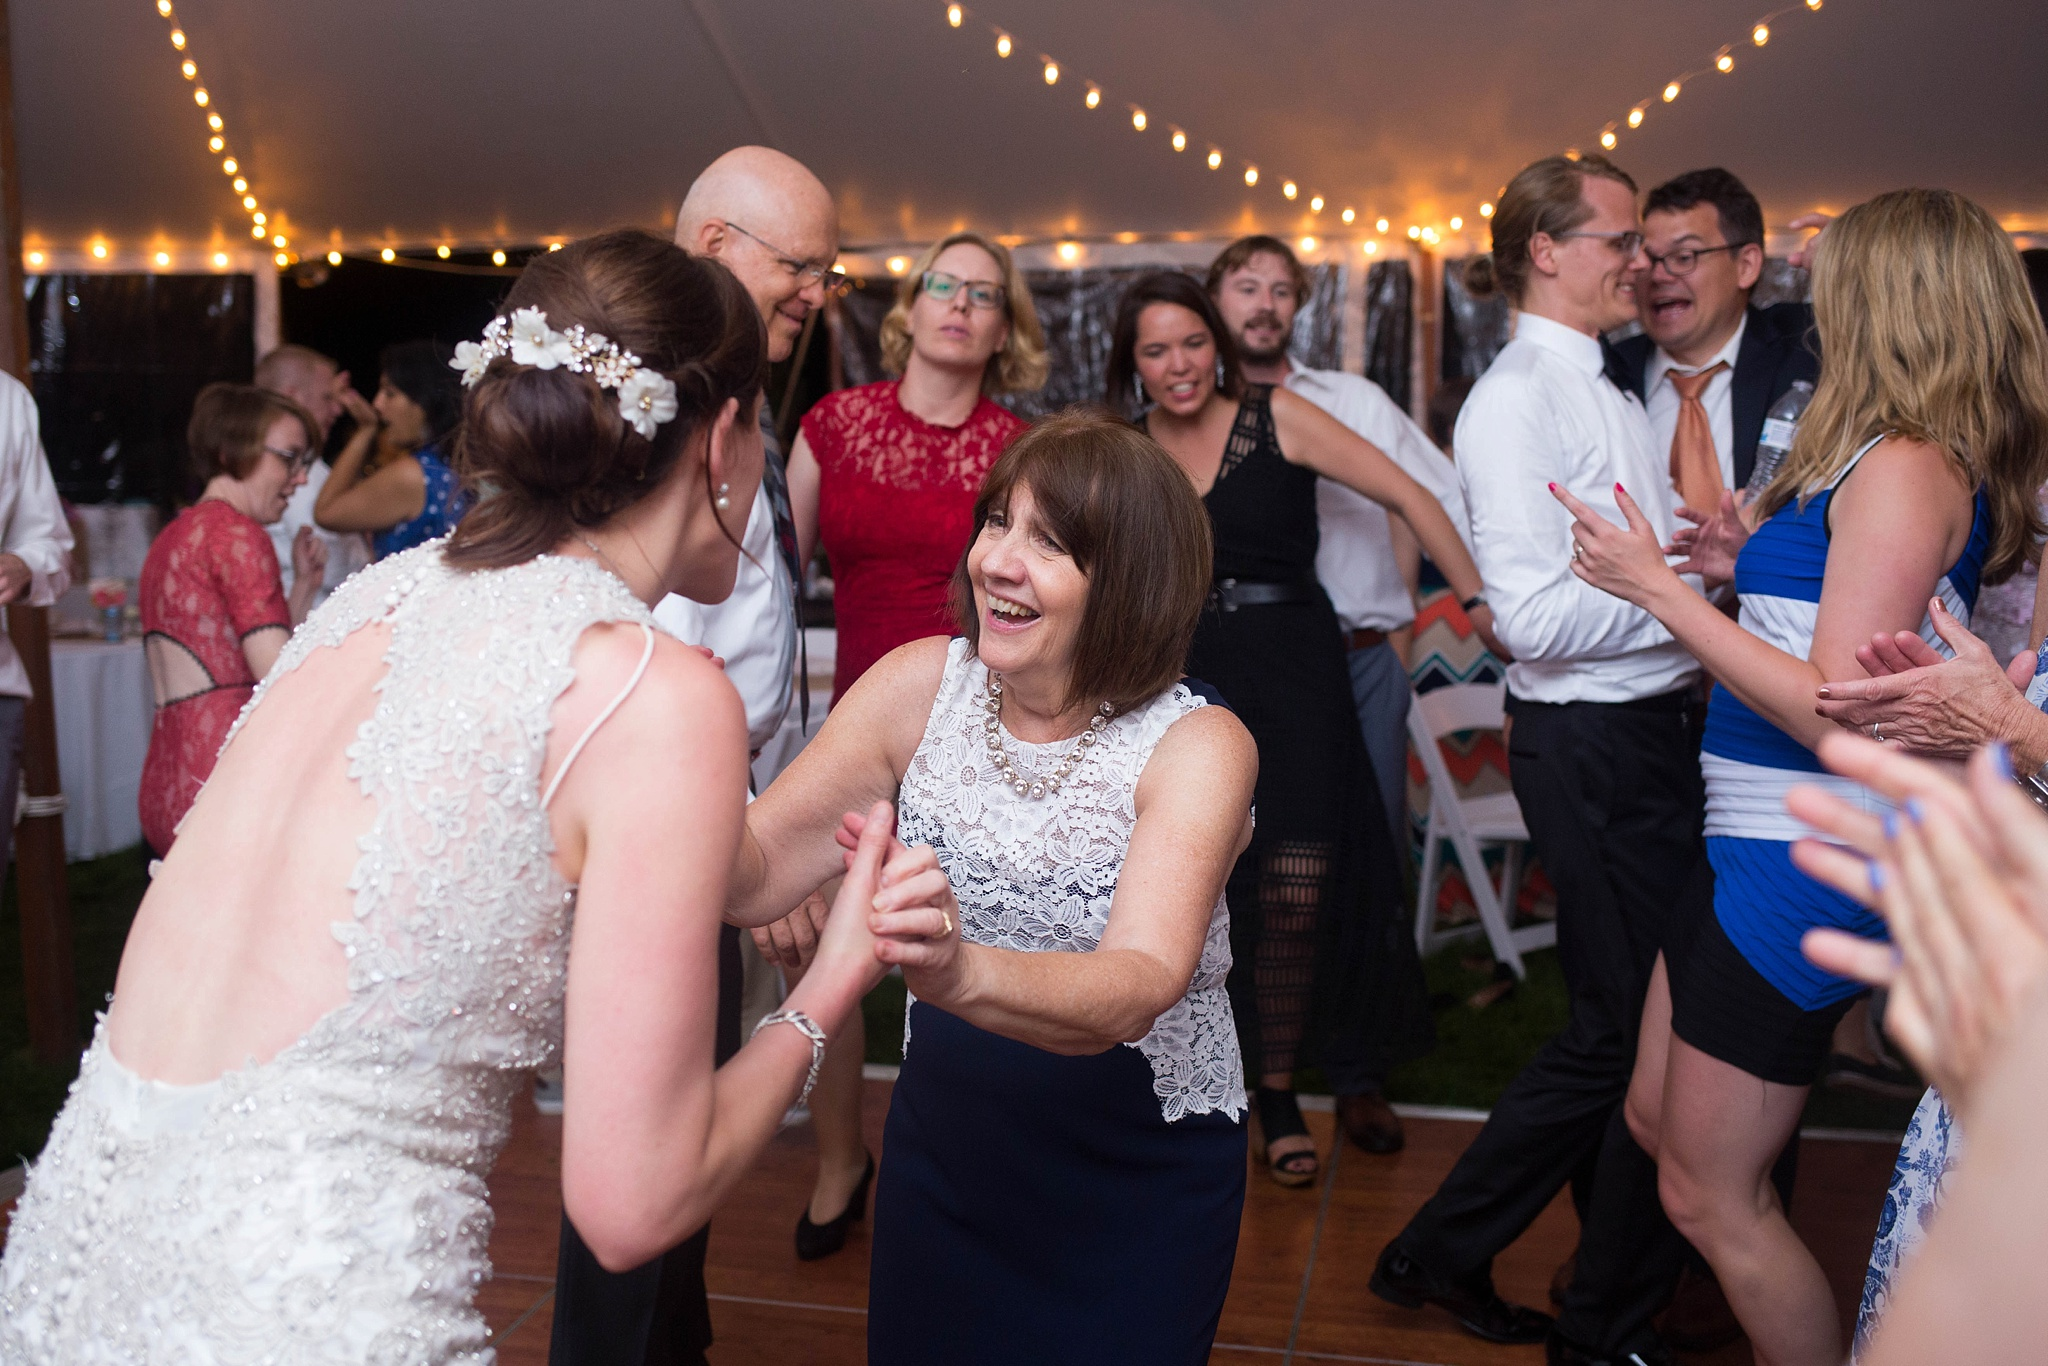 mom and bride at wedding